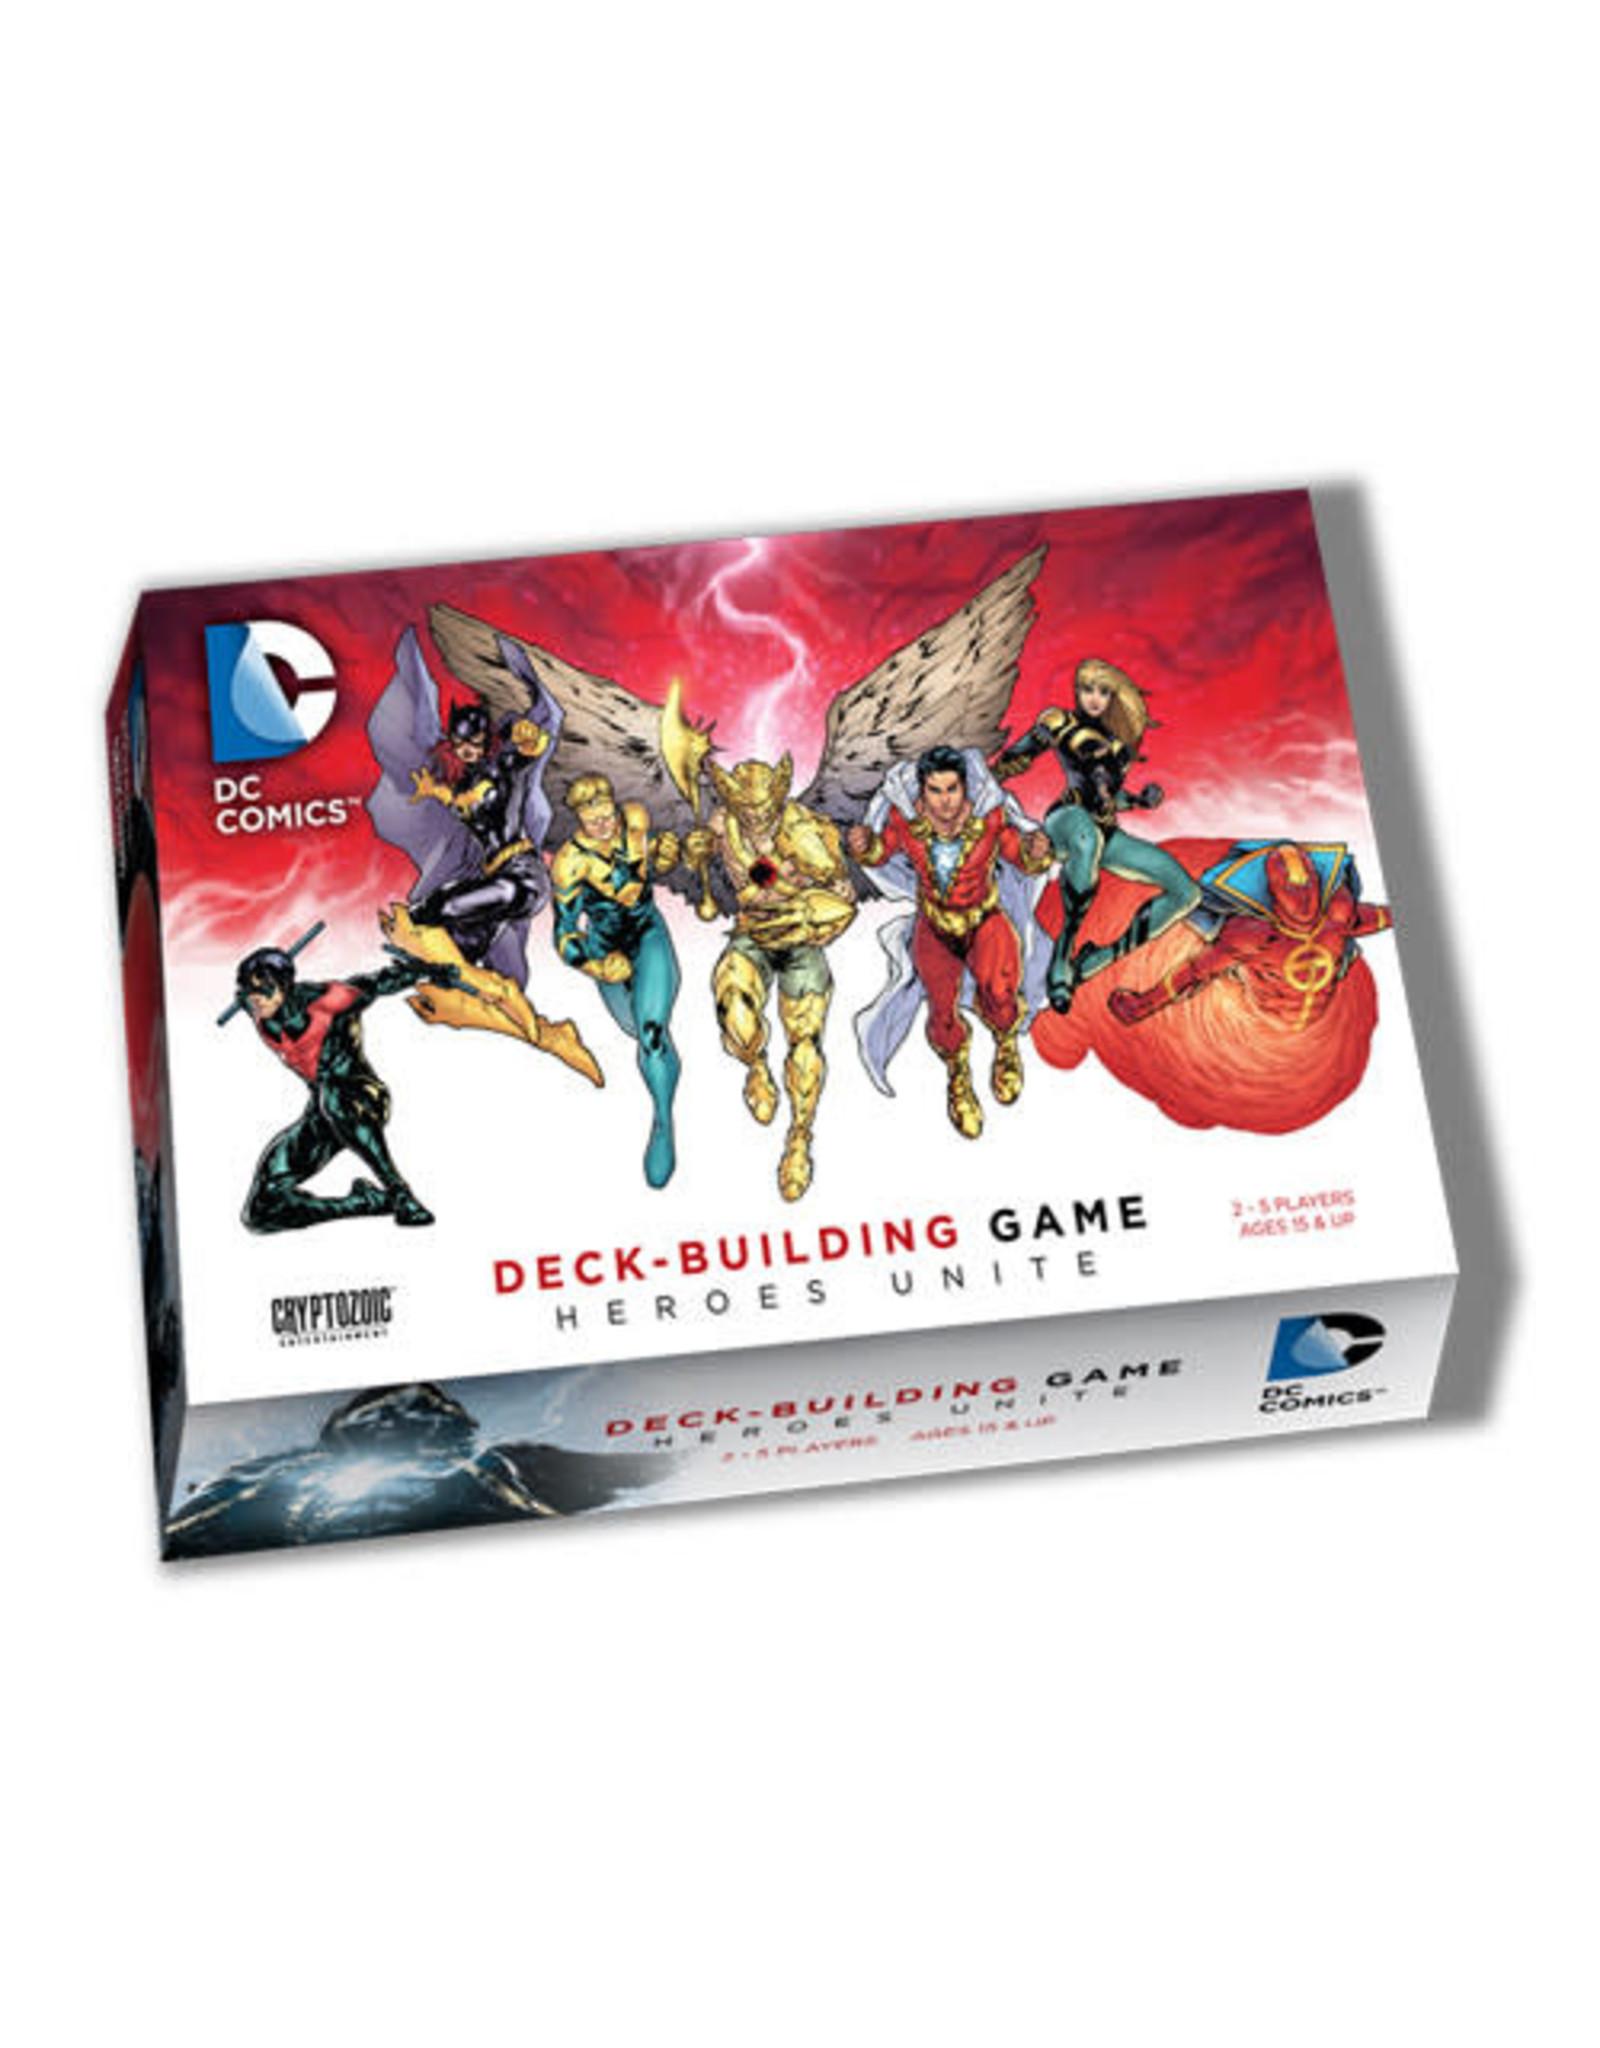 DC Comics Deck Building Game Heroes Unite